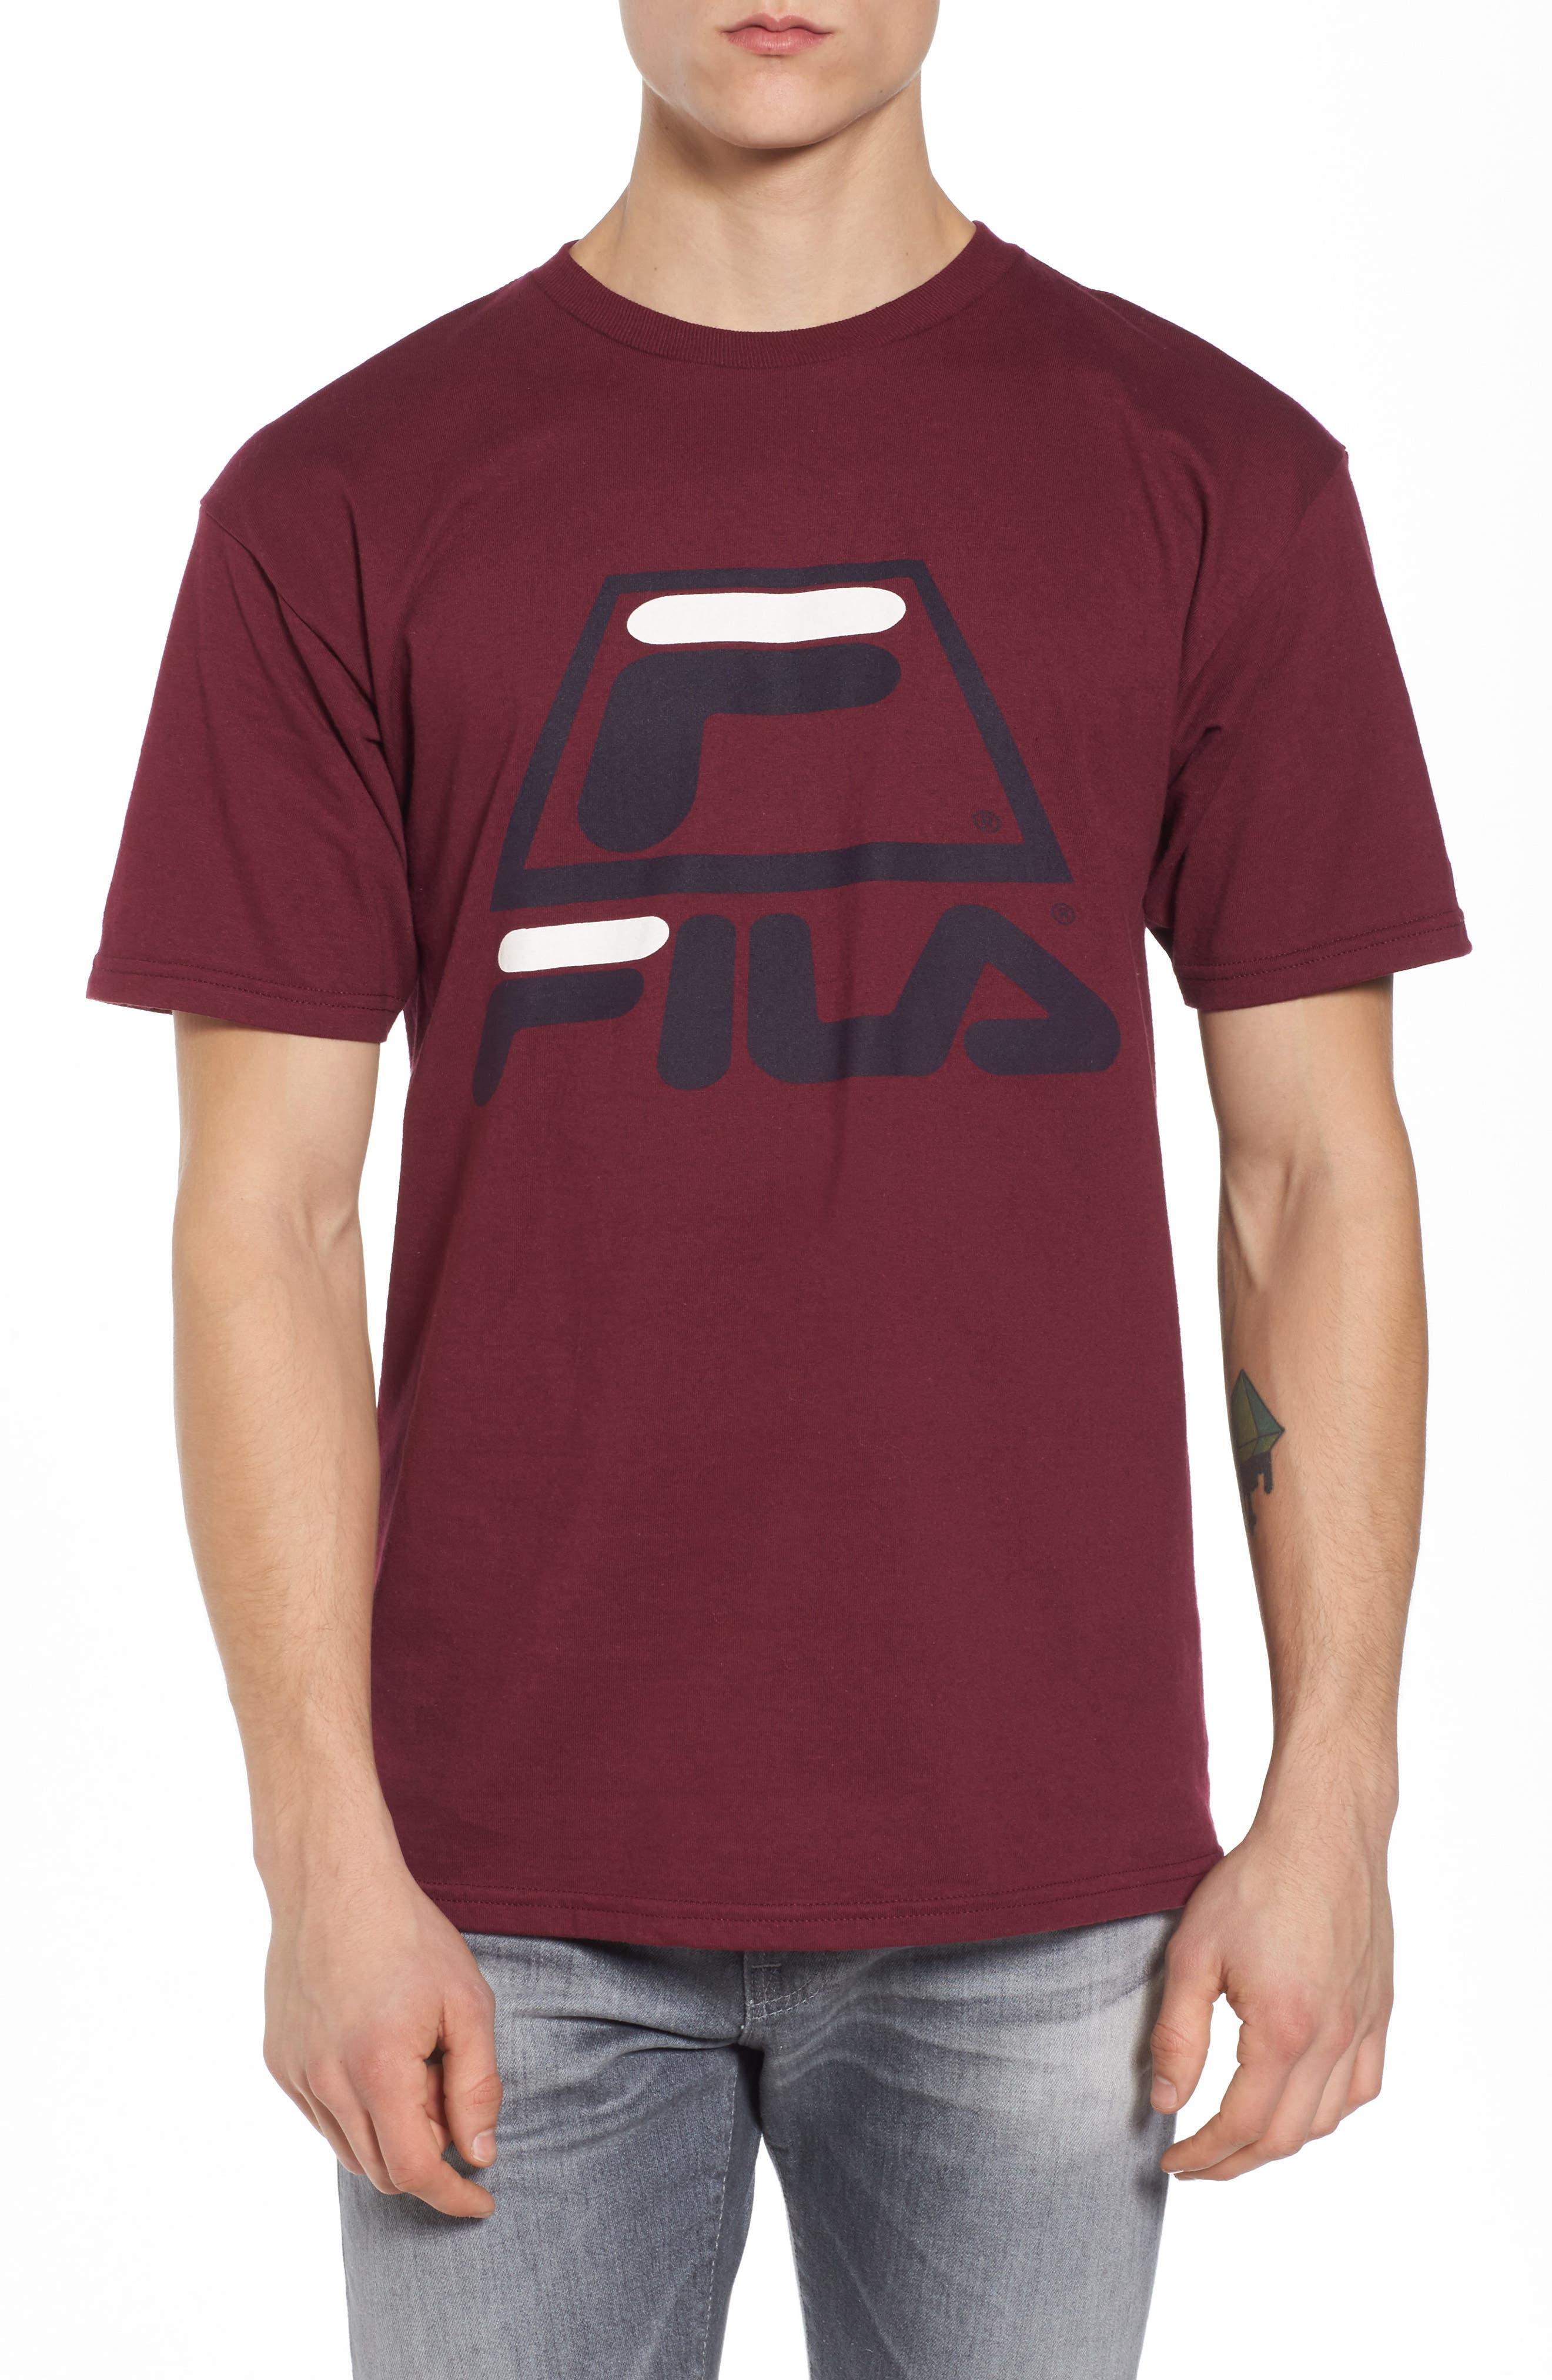 '95 T-Shirt,                             Main thumbnail 1, color,                             Navy/ Silver Birch/ White